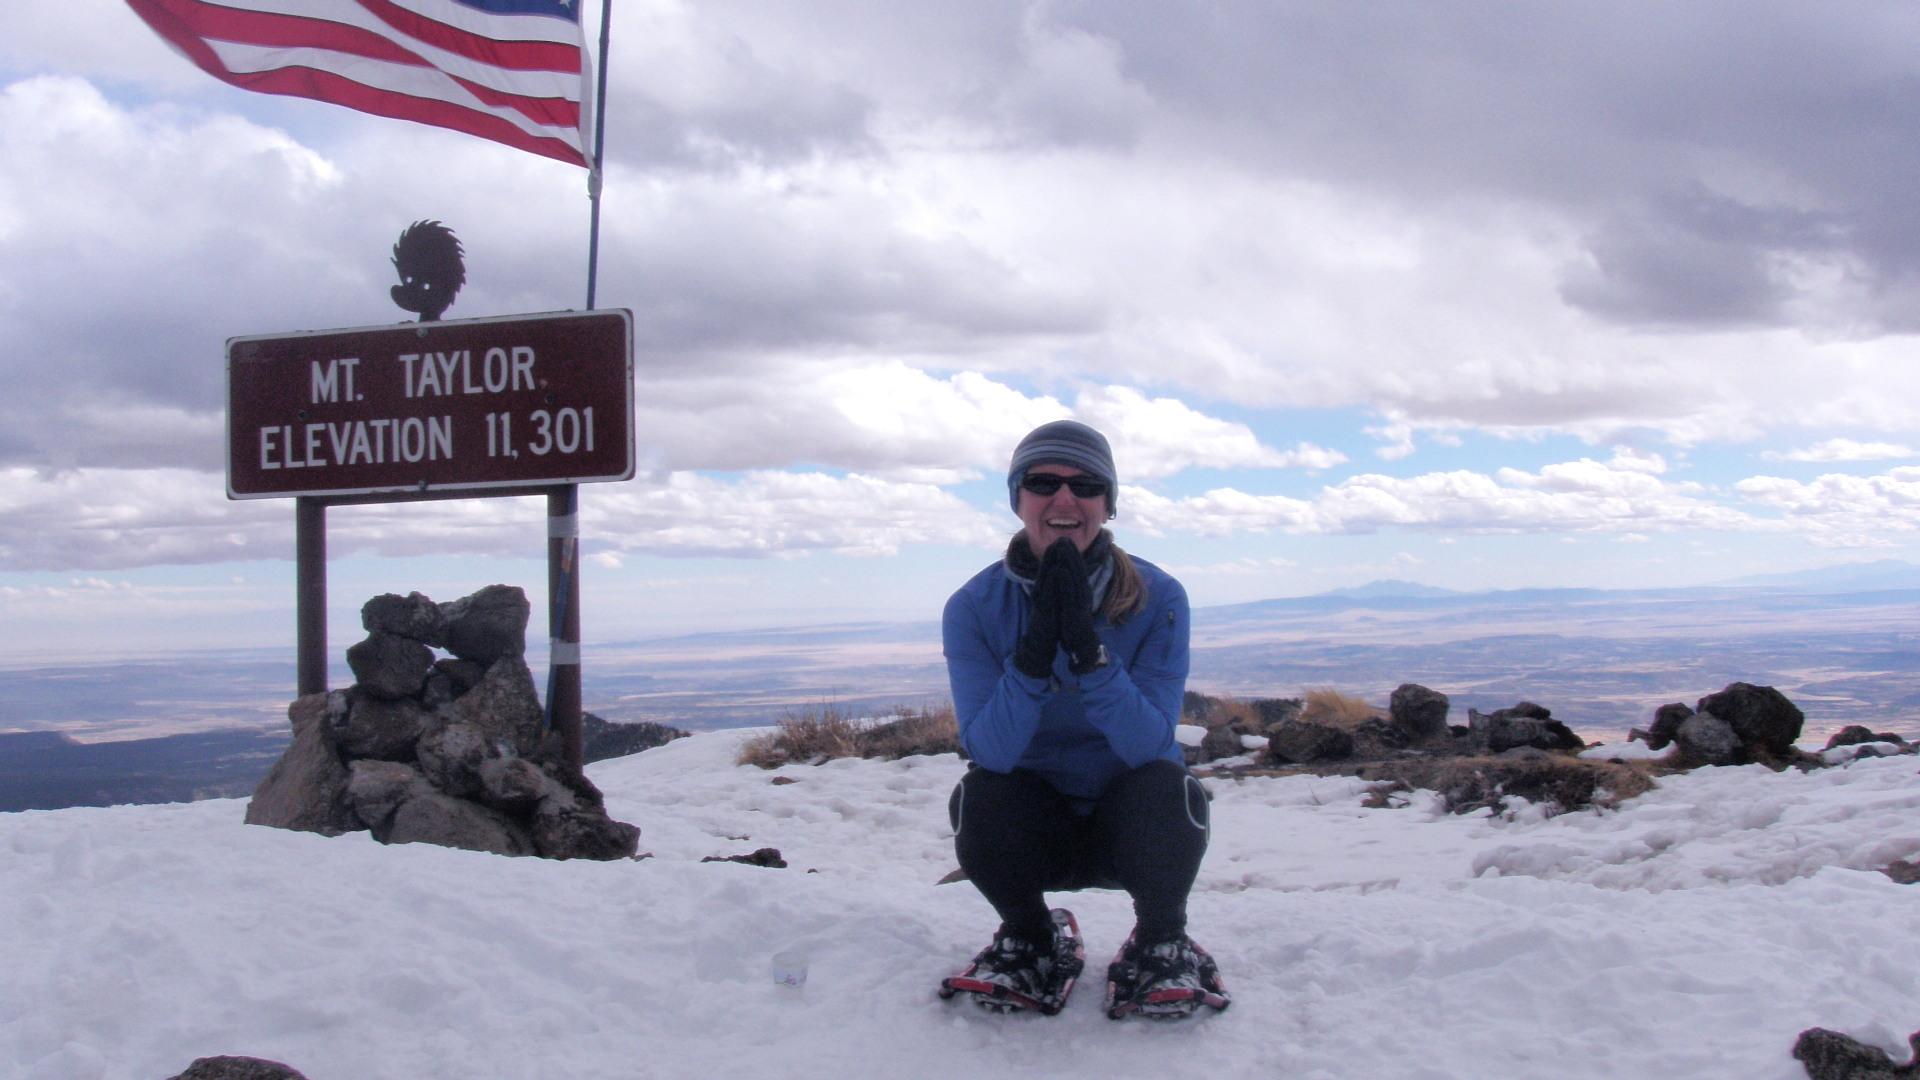 Shishya PY; Turquoise Mountain Race Report: 2/20/2011